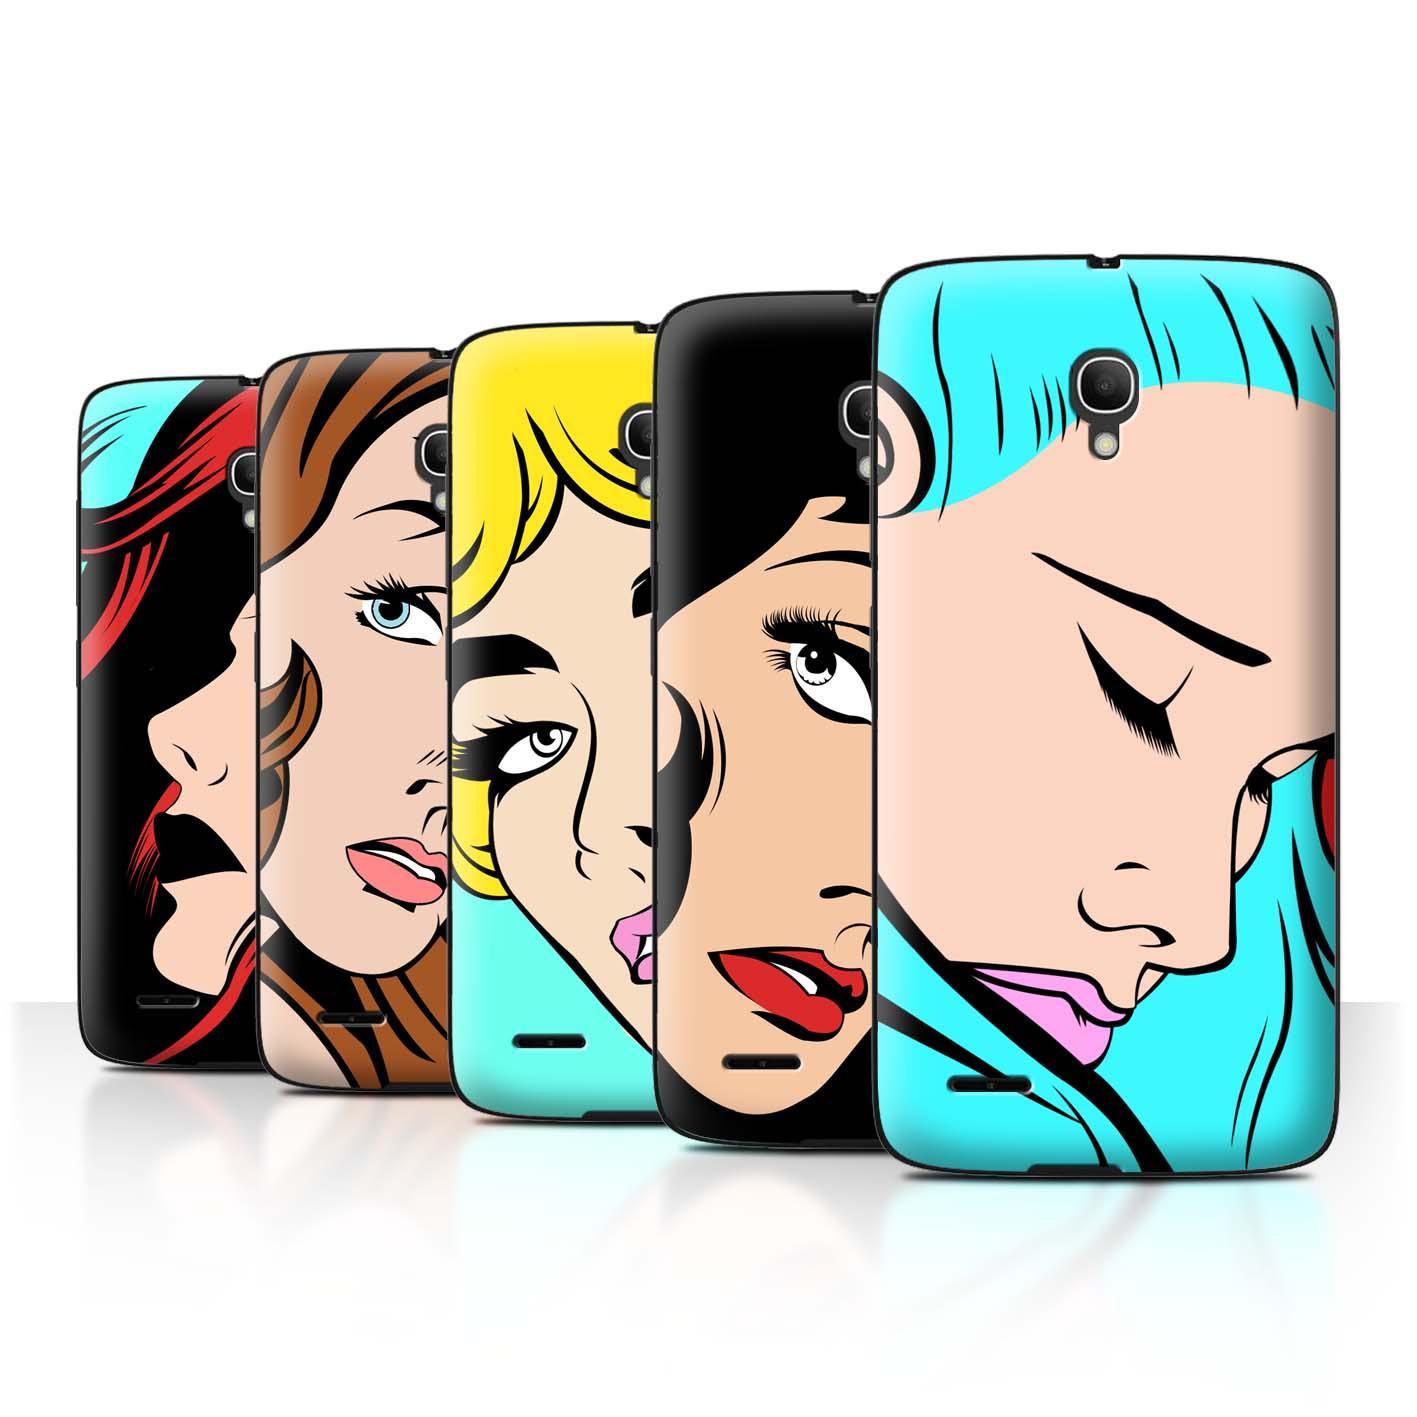 STUFF4-Back-Case-Cover-Skin-for-Alcatel-Pop-2-5-034-Comic-Illustrated-Girls